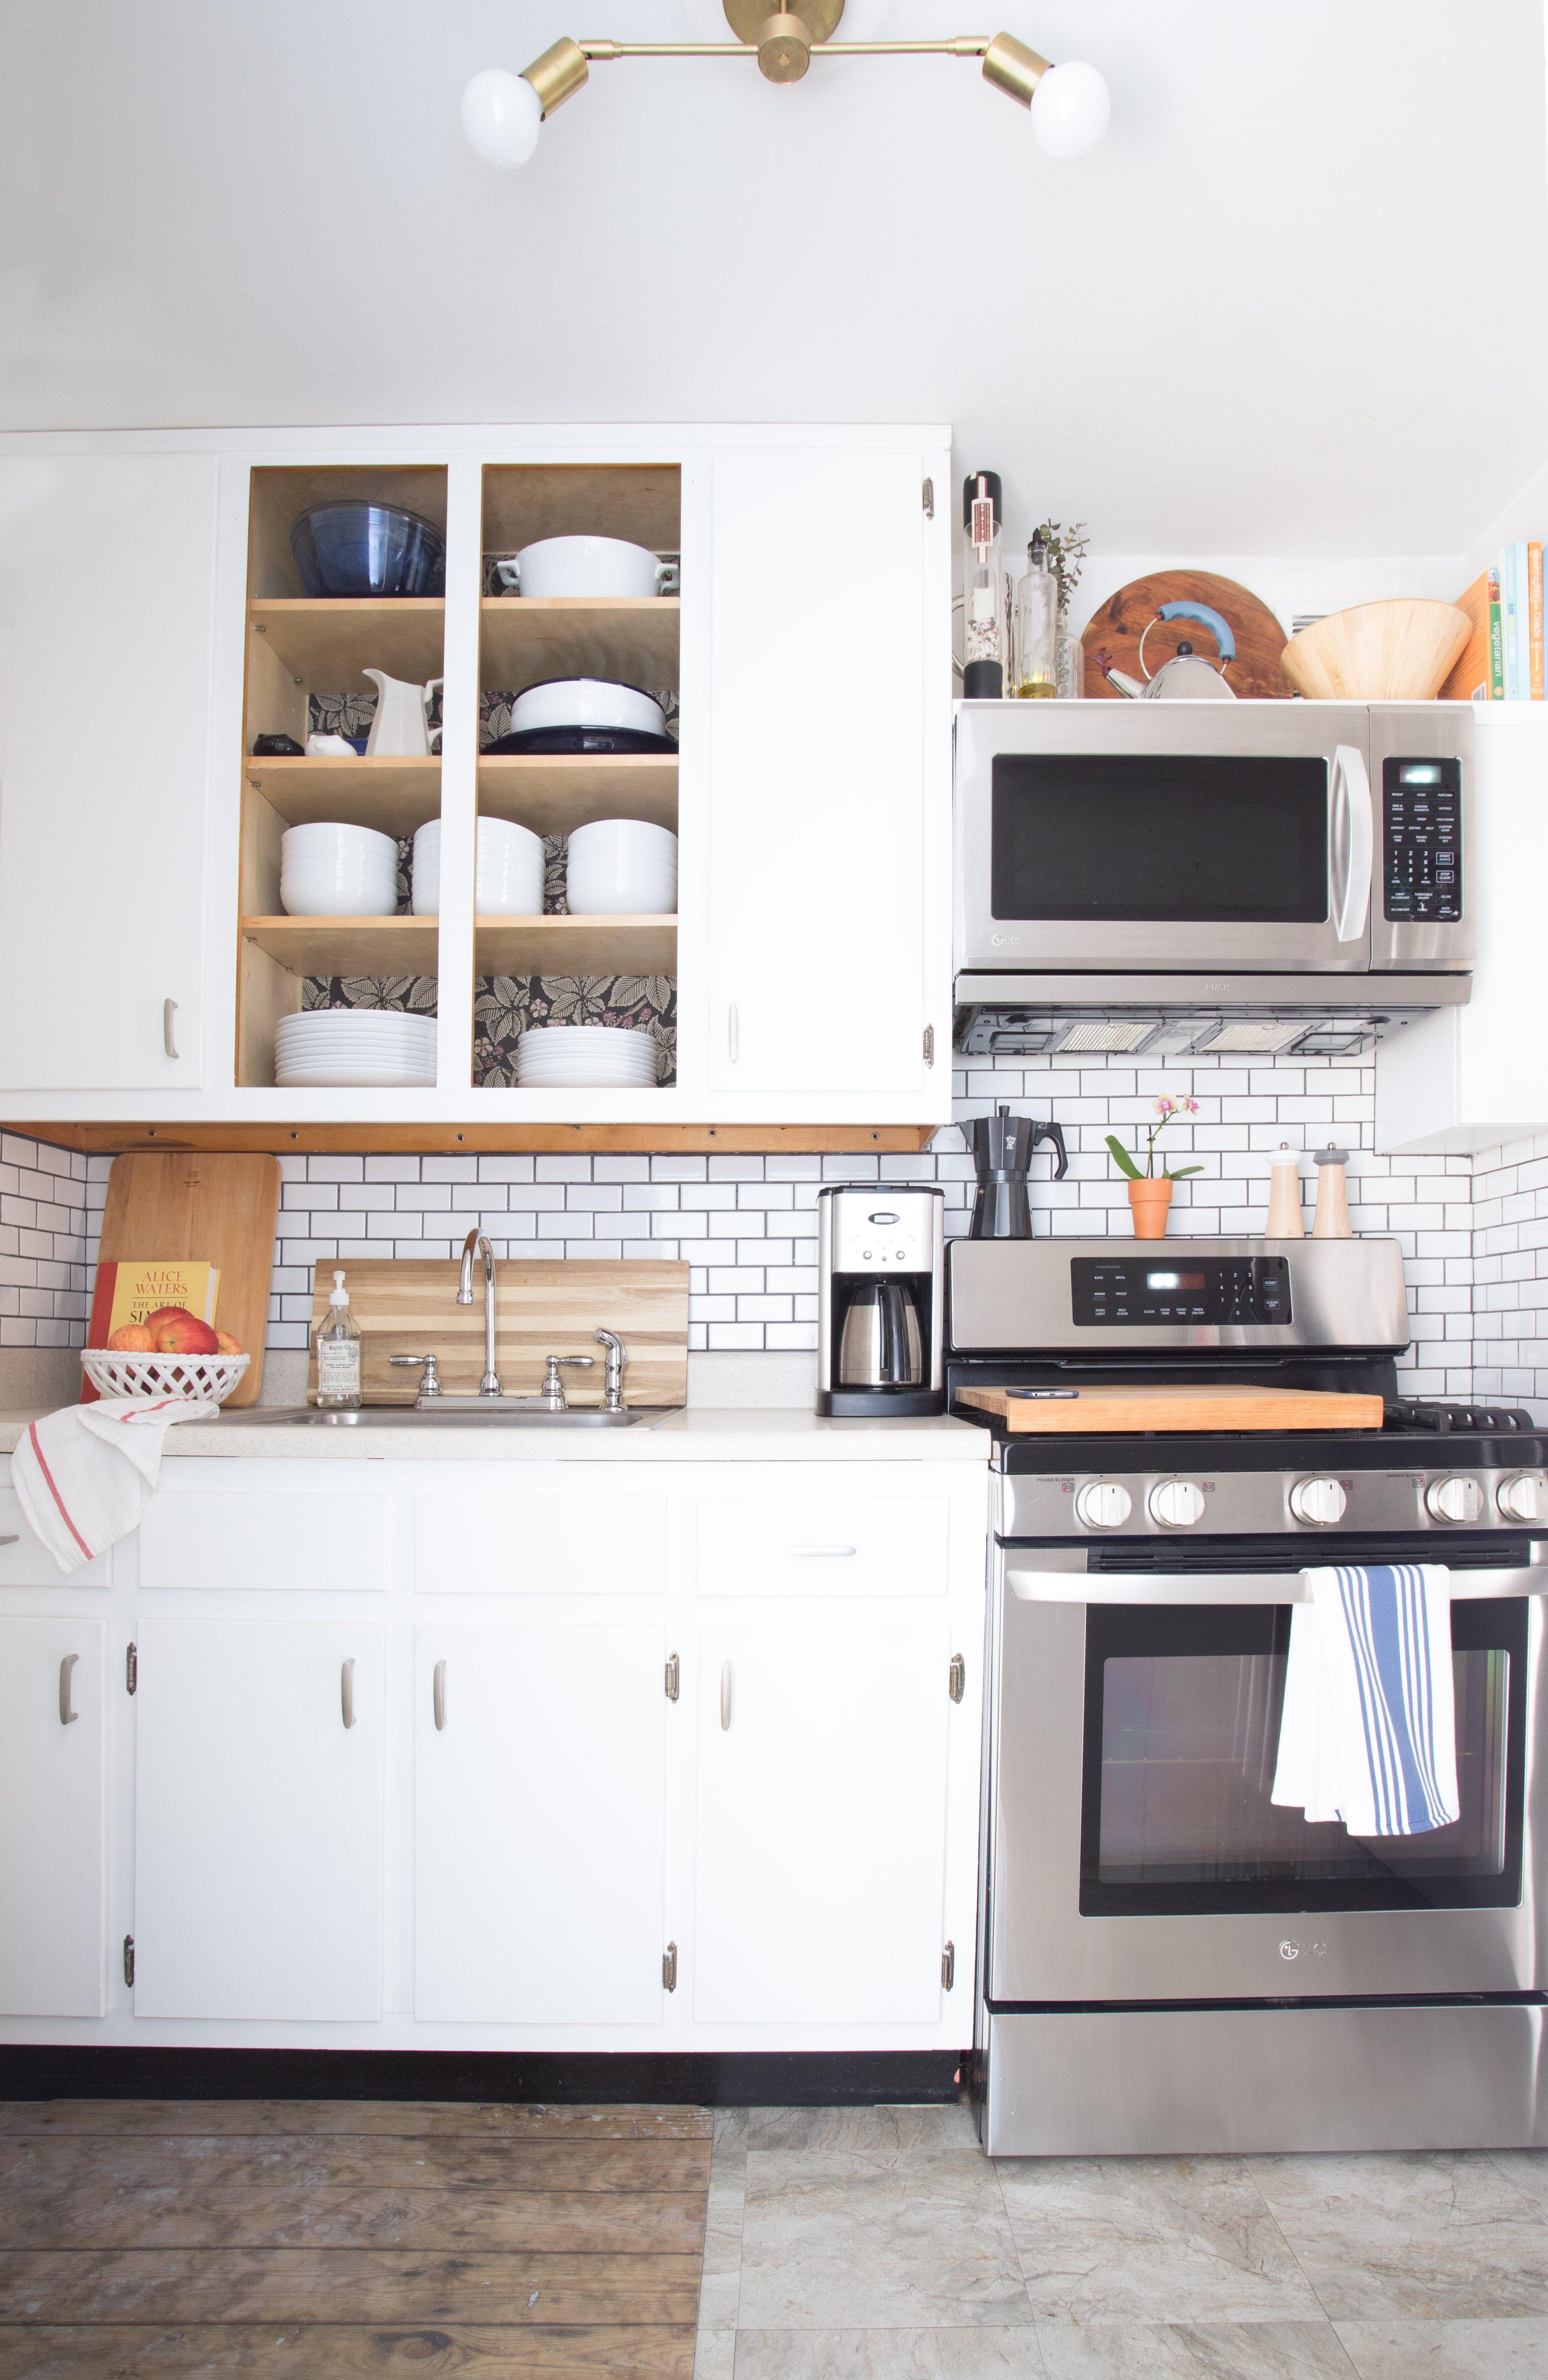 Epic Kitchen Inspiration Jun 2018 Kitchen Design Ideas 2018